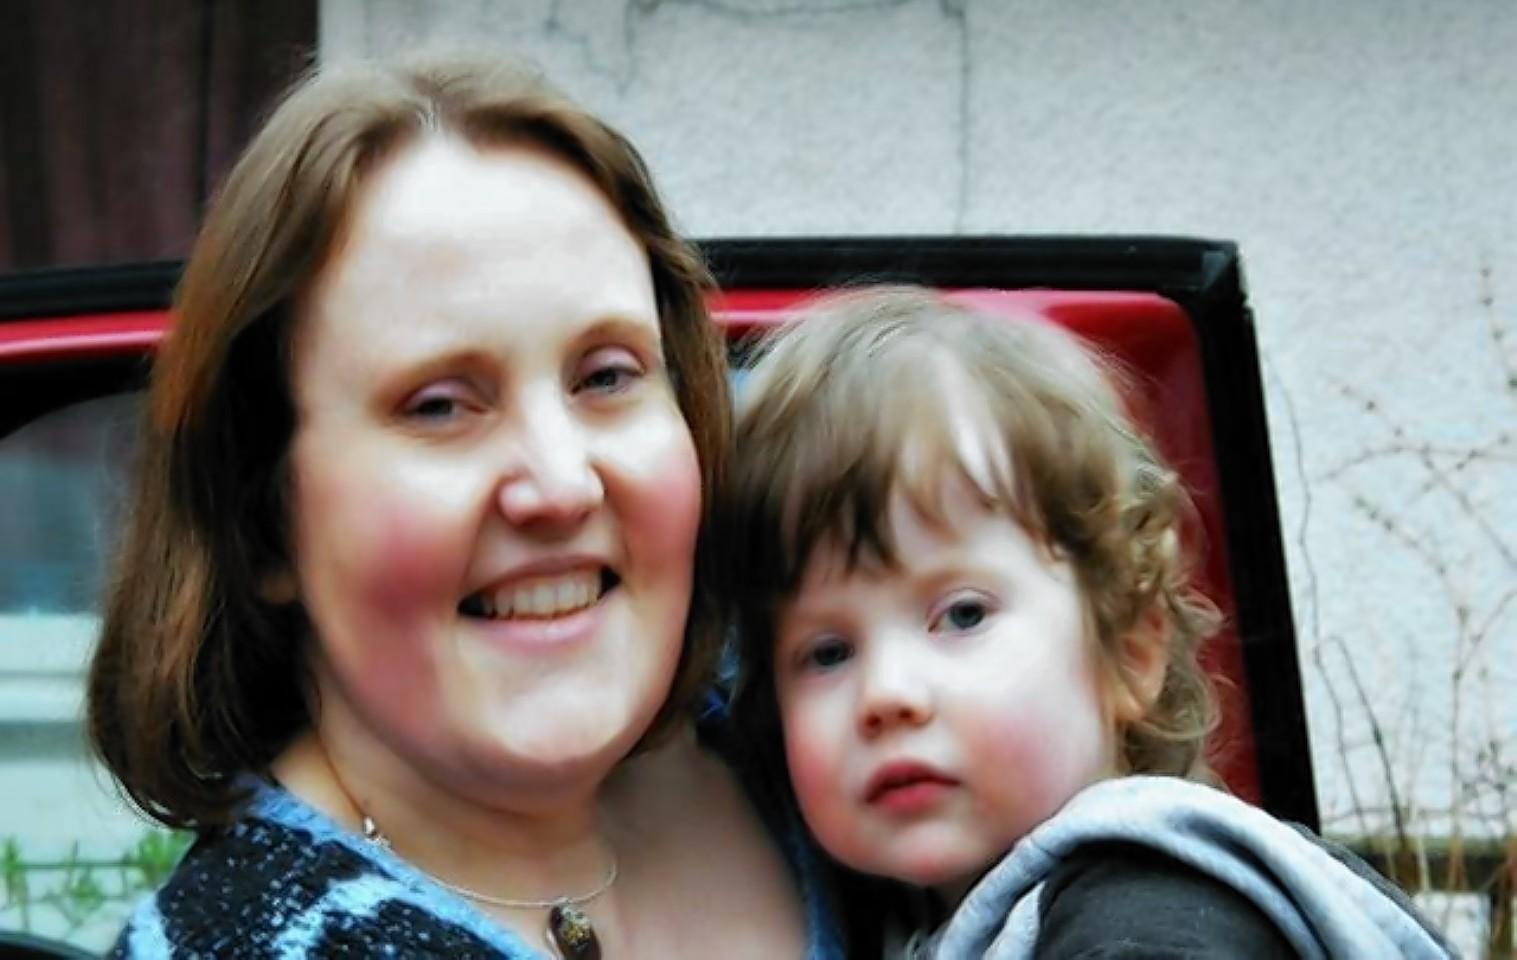 Alex Shoebridge and her son